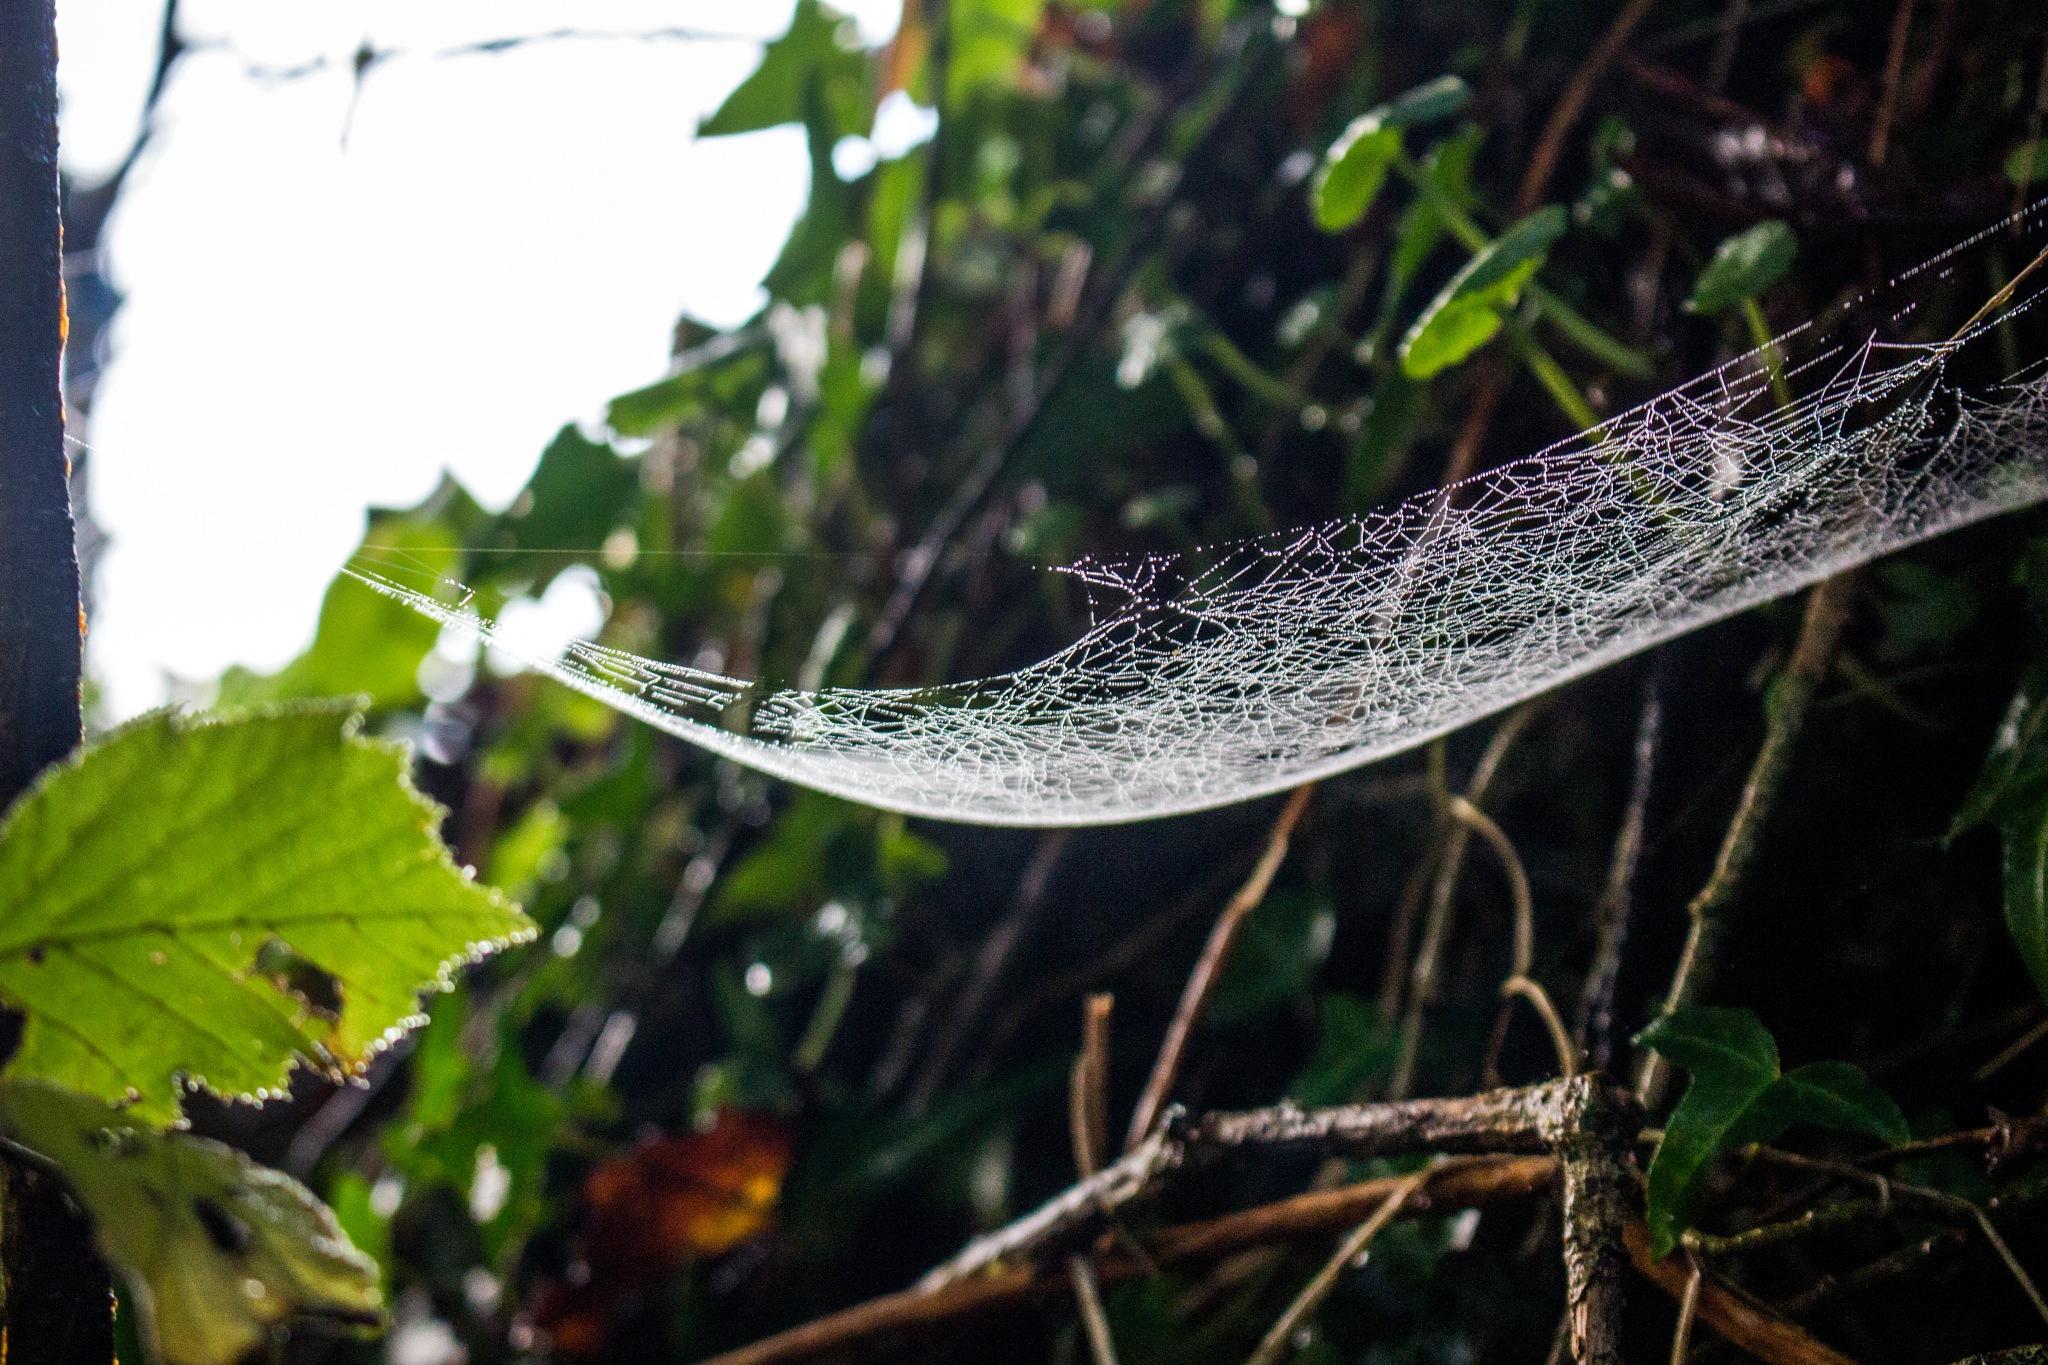 Intricate Web by Steve Rowe